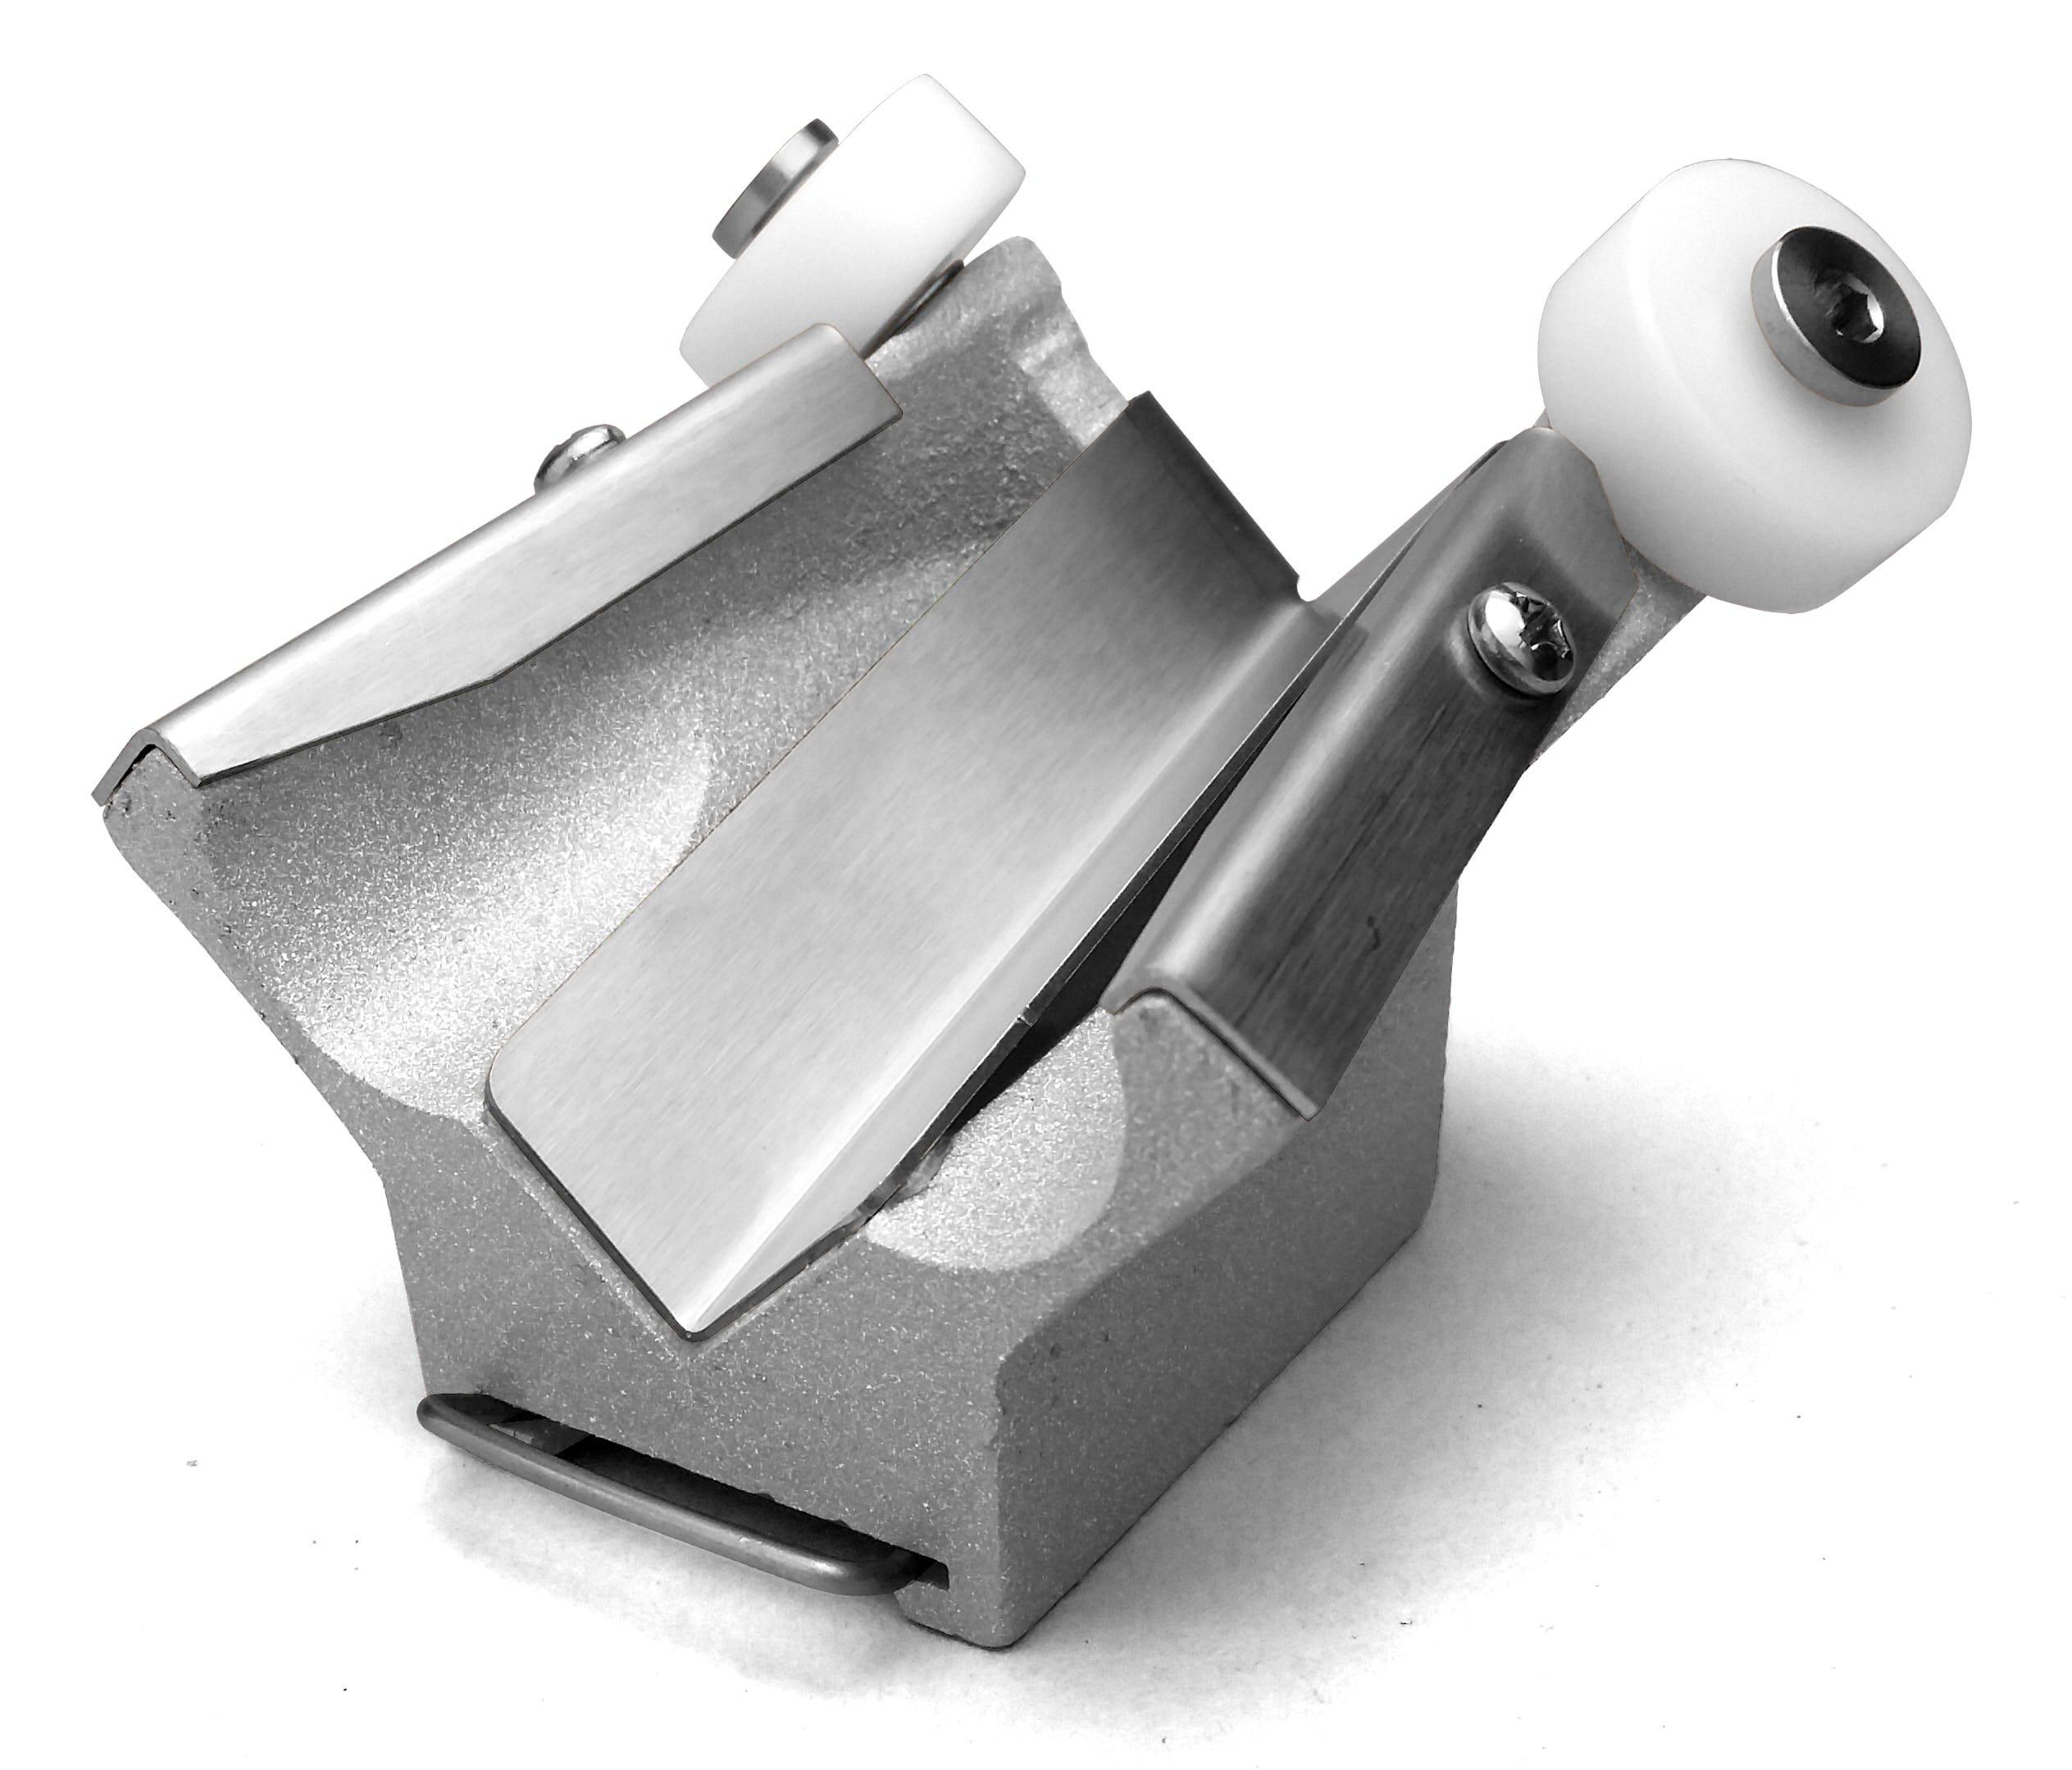 CanAm Tool F100 Standard Outside Corner Applicator Head – The Original For Mudding Outside Corners